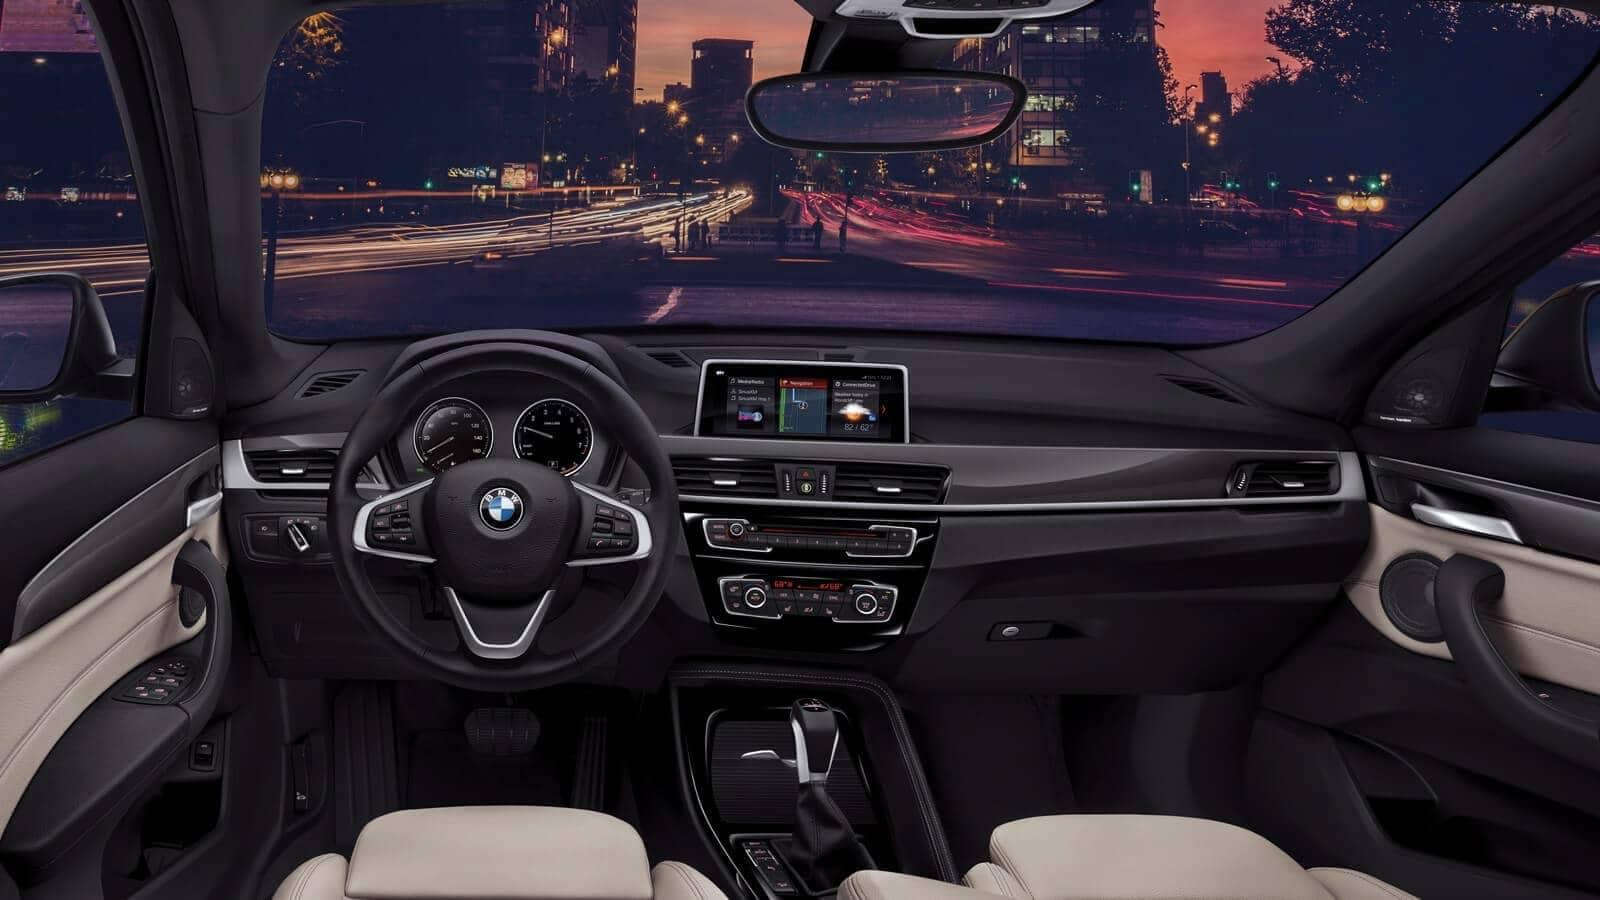 2019 BMW X1 central information display